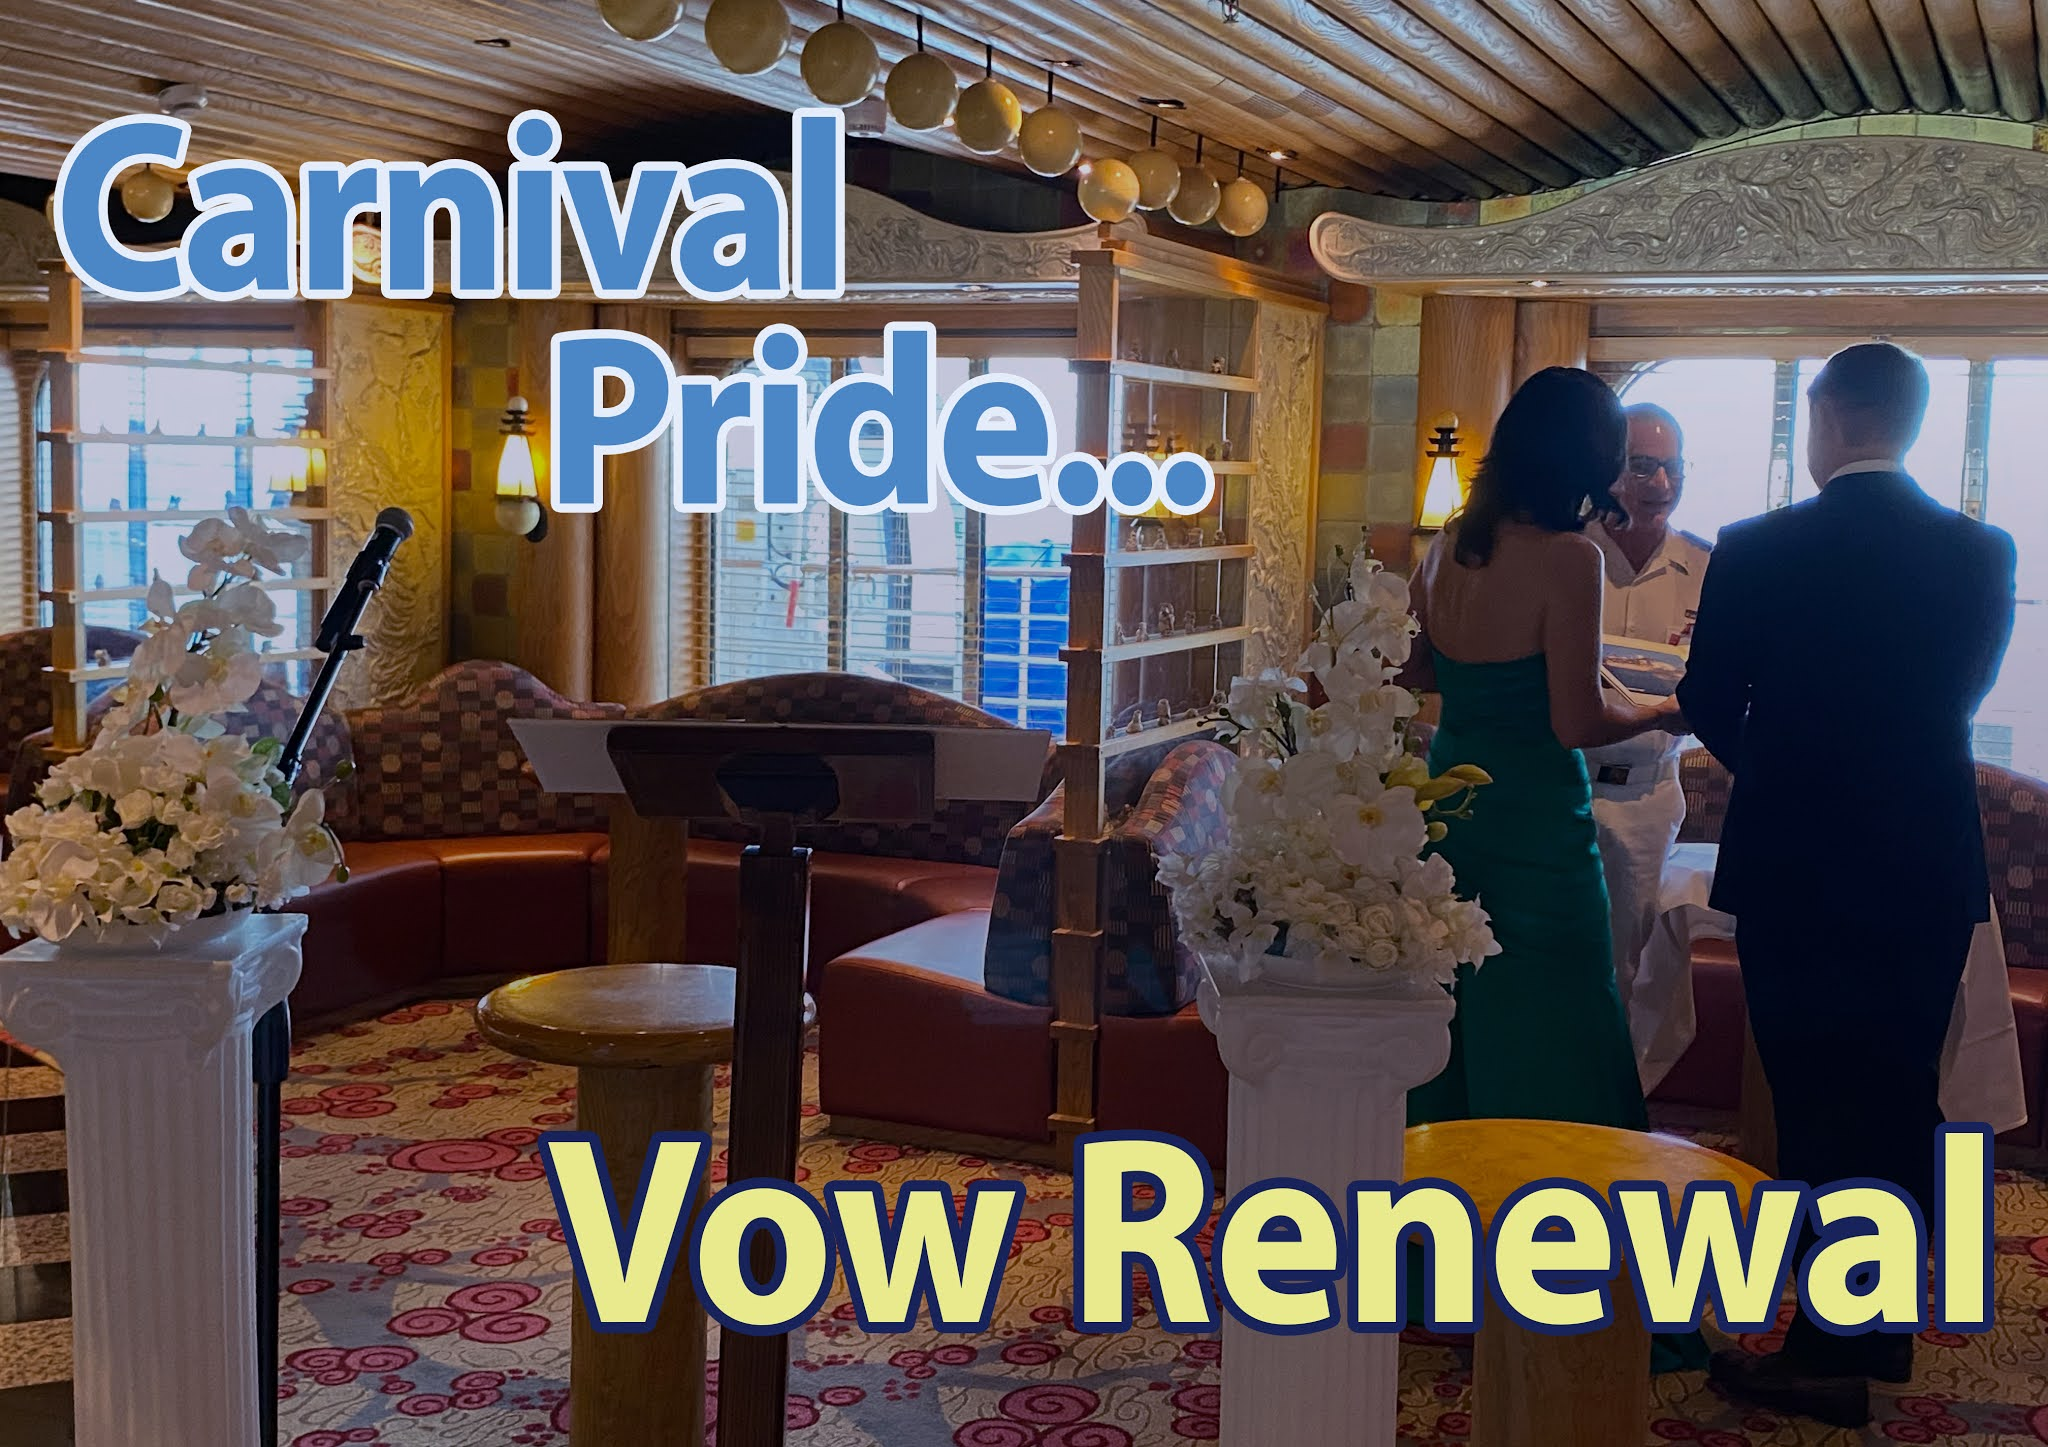 Carnival Pride Vow renewal Blog Post link